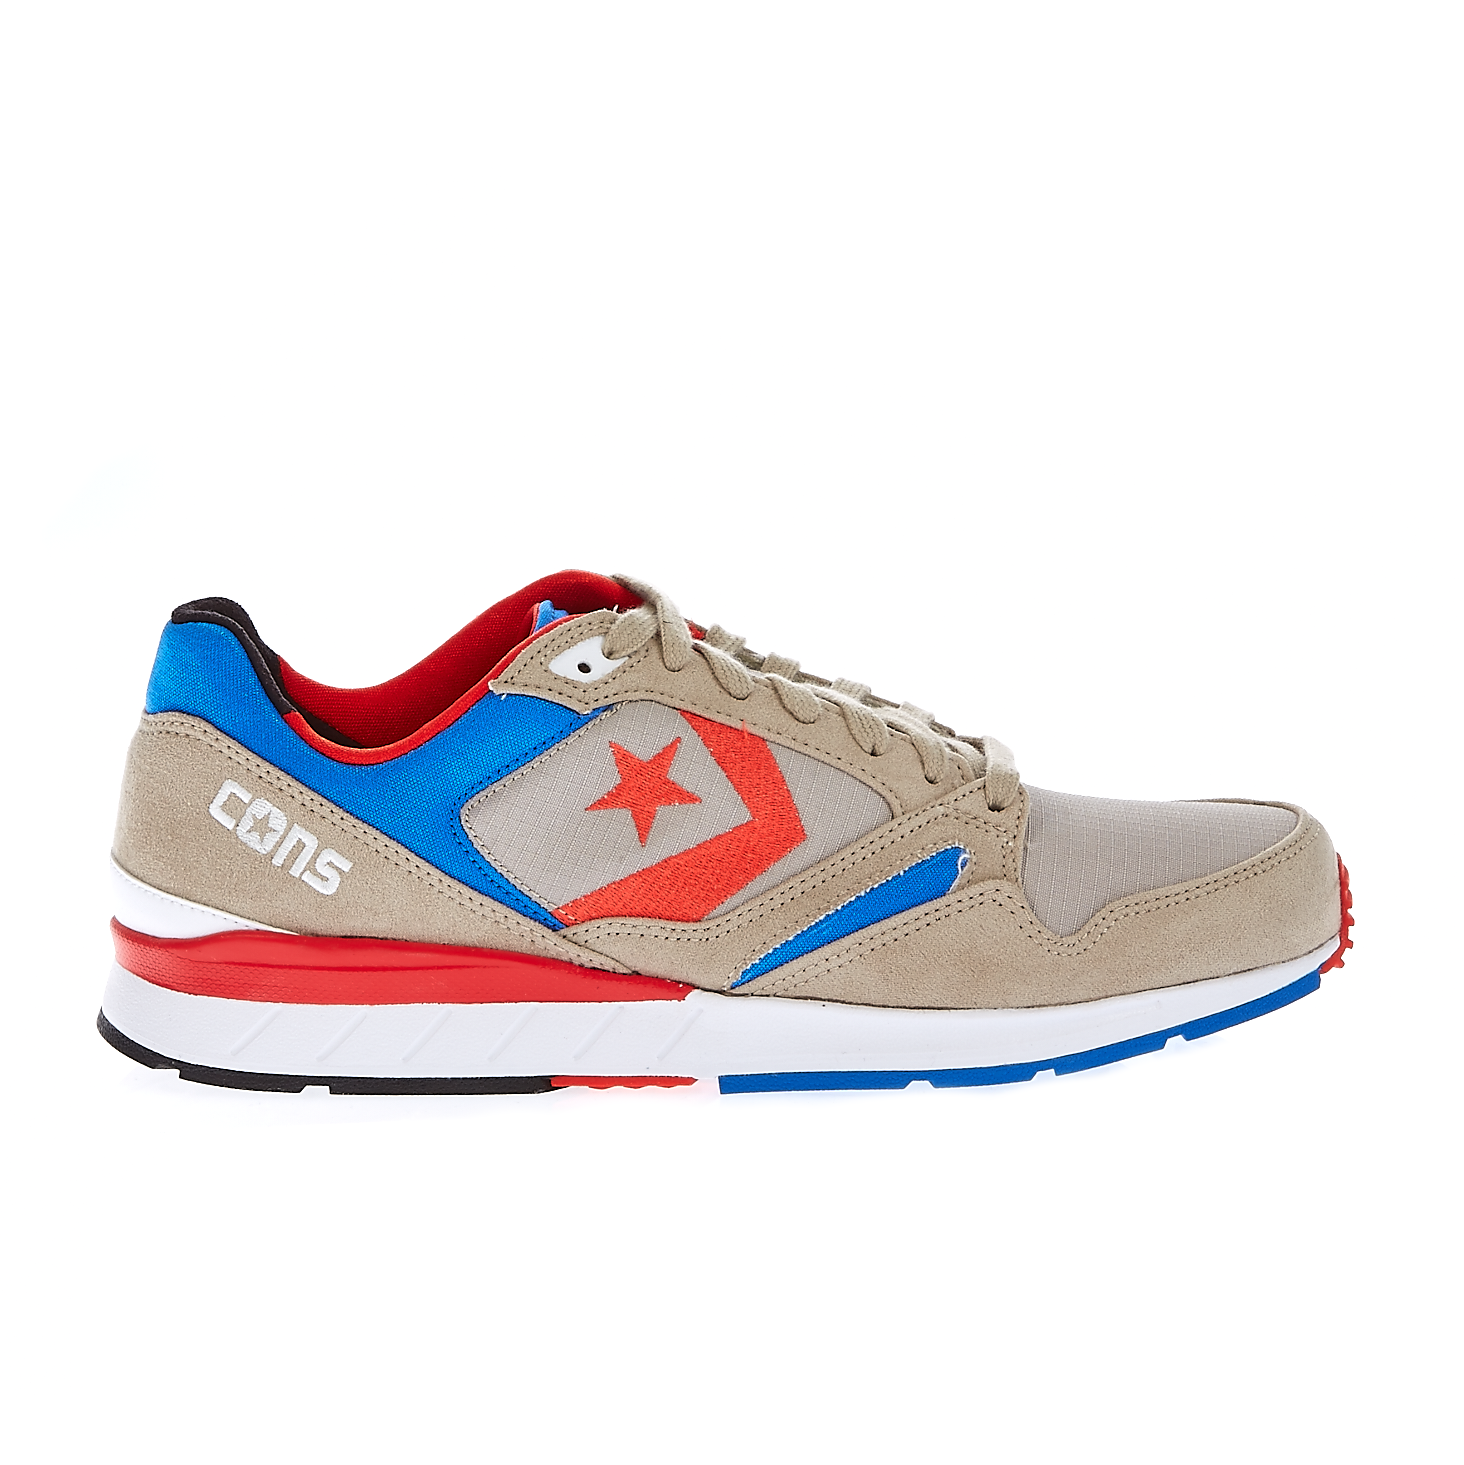 CONVERSE – Ανδρικά παπούτσια Wave Racer μπεζ